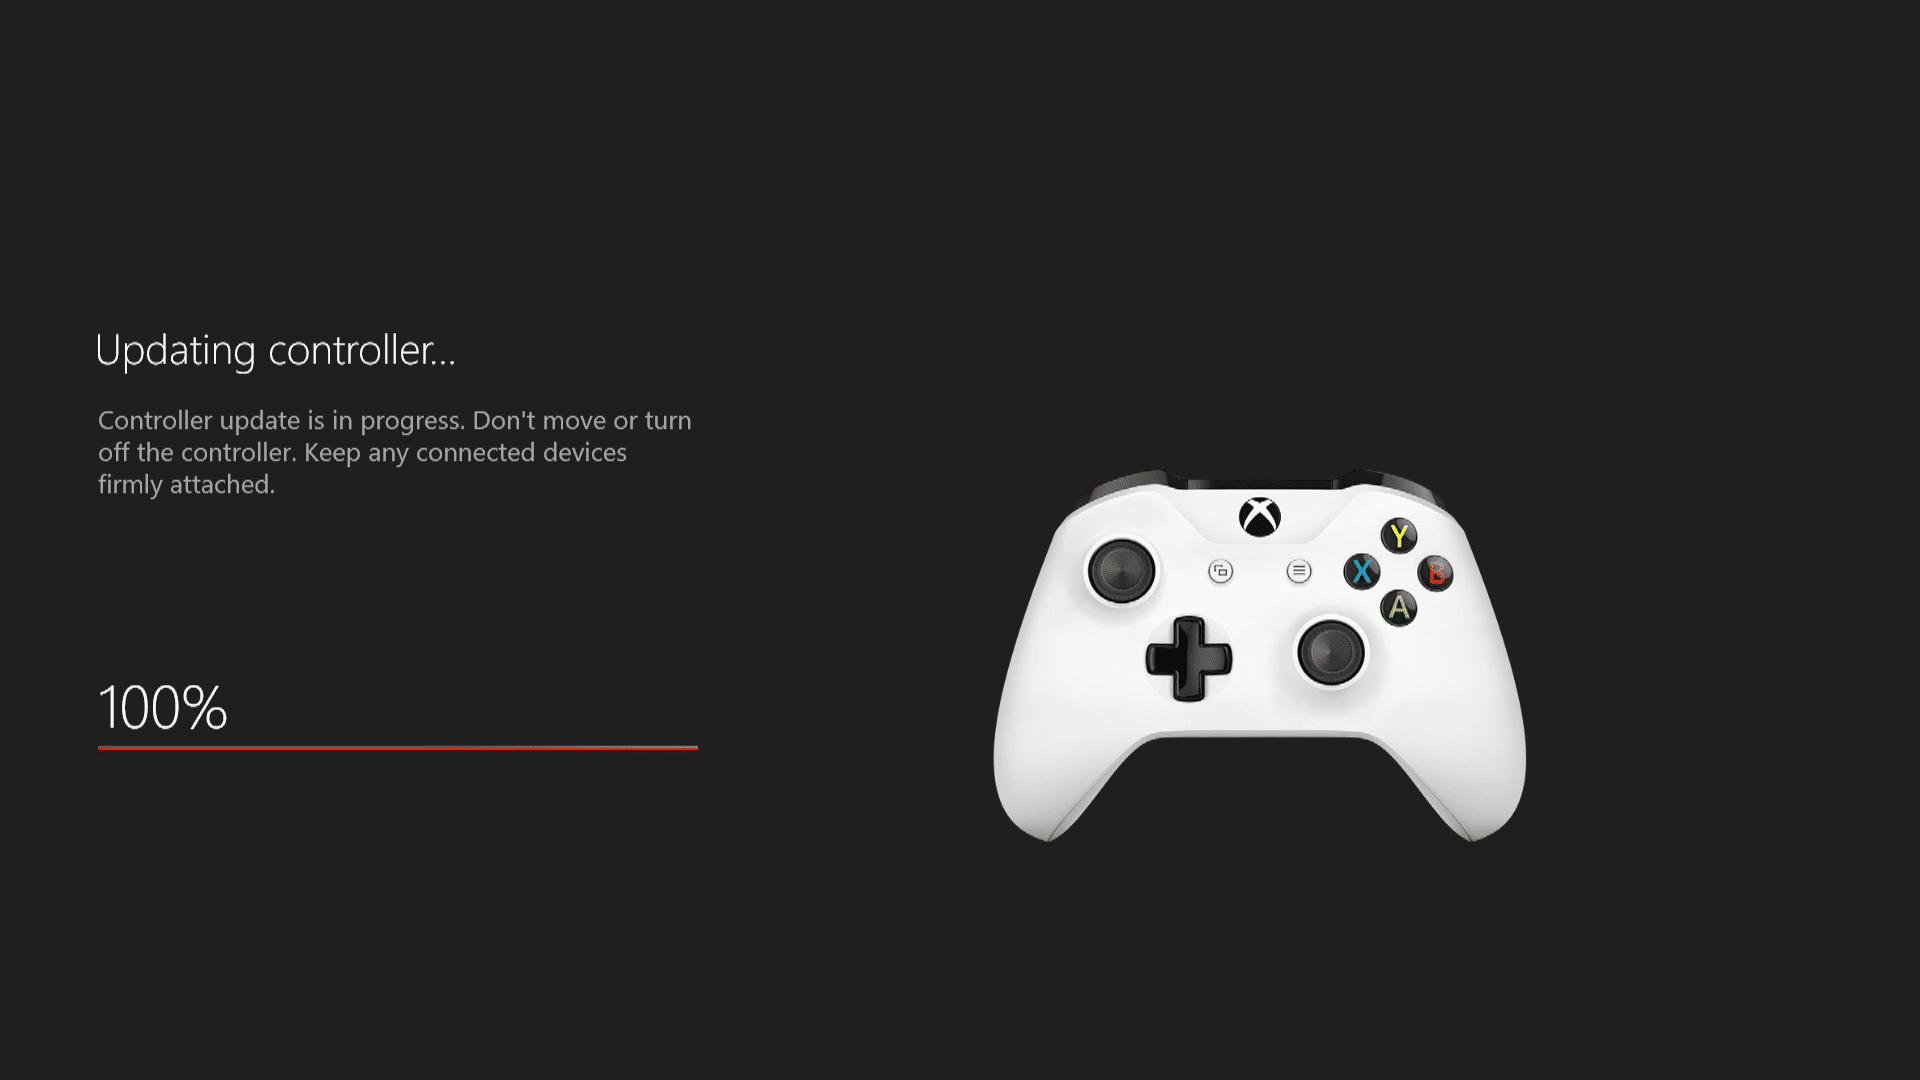 A screenshot of an Xbox One controller updating.